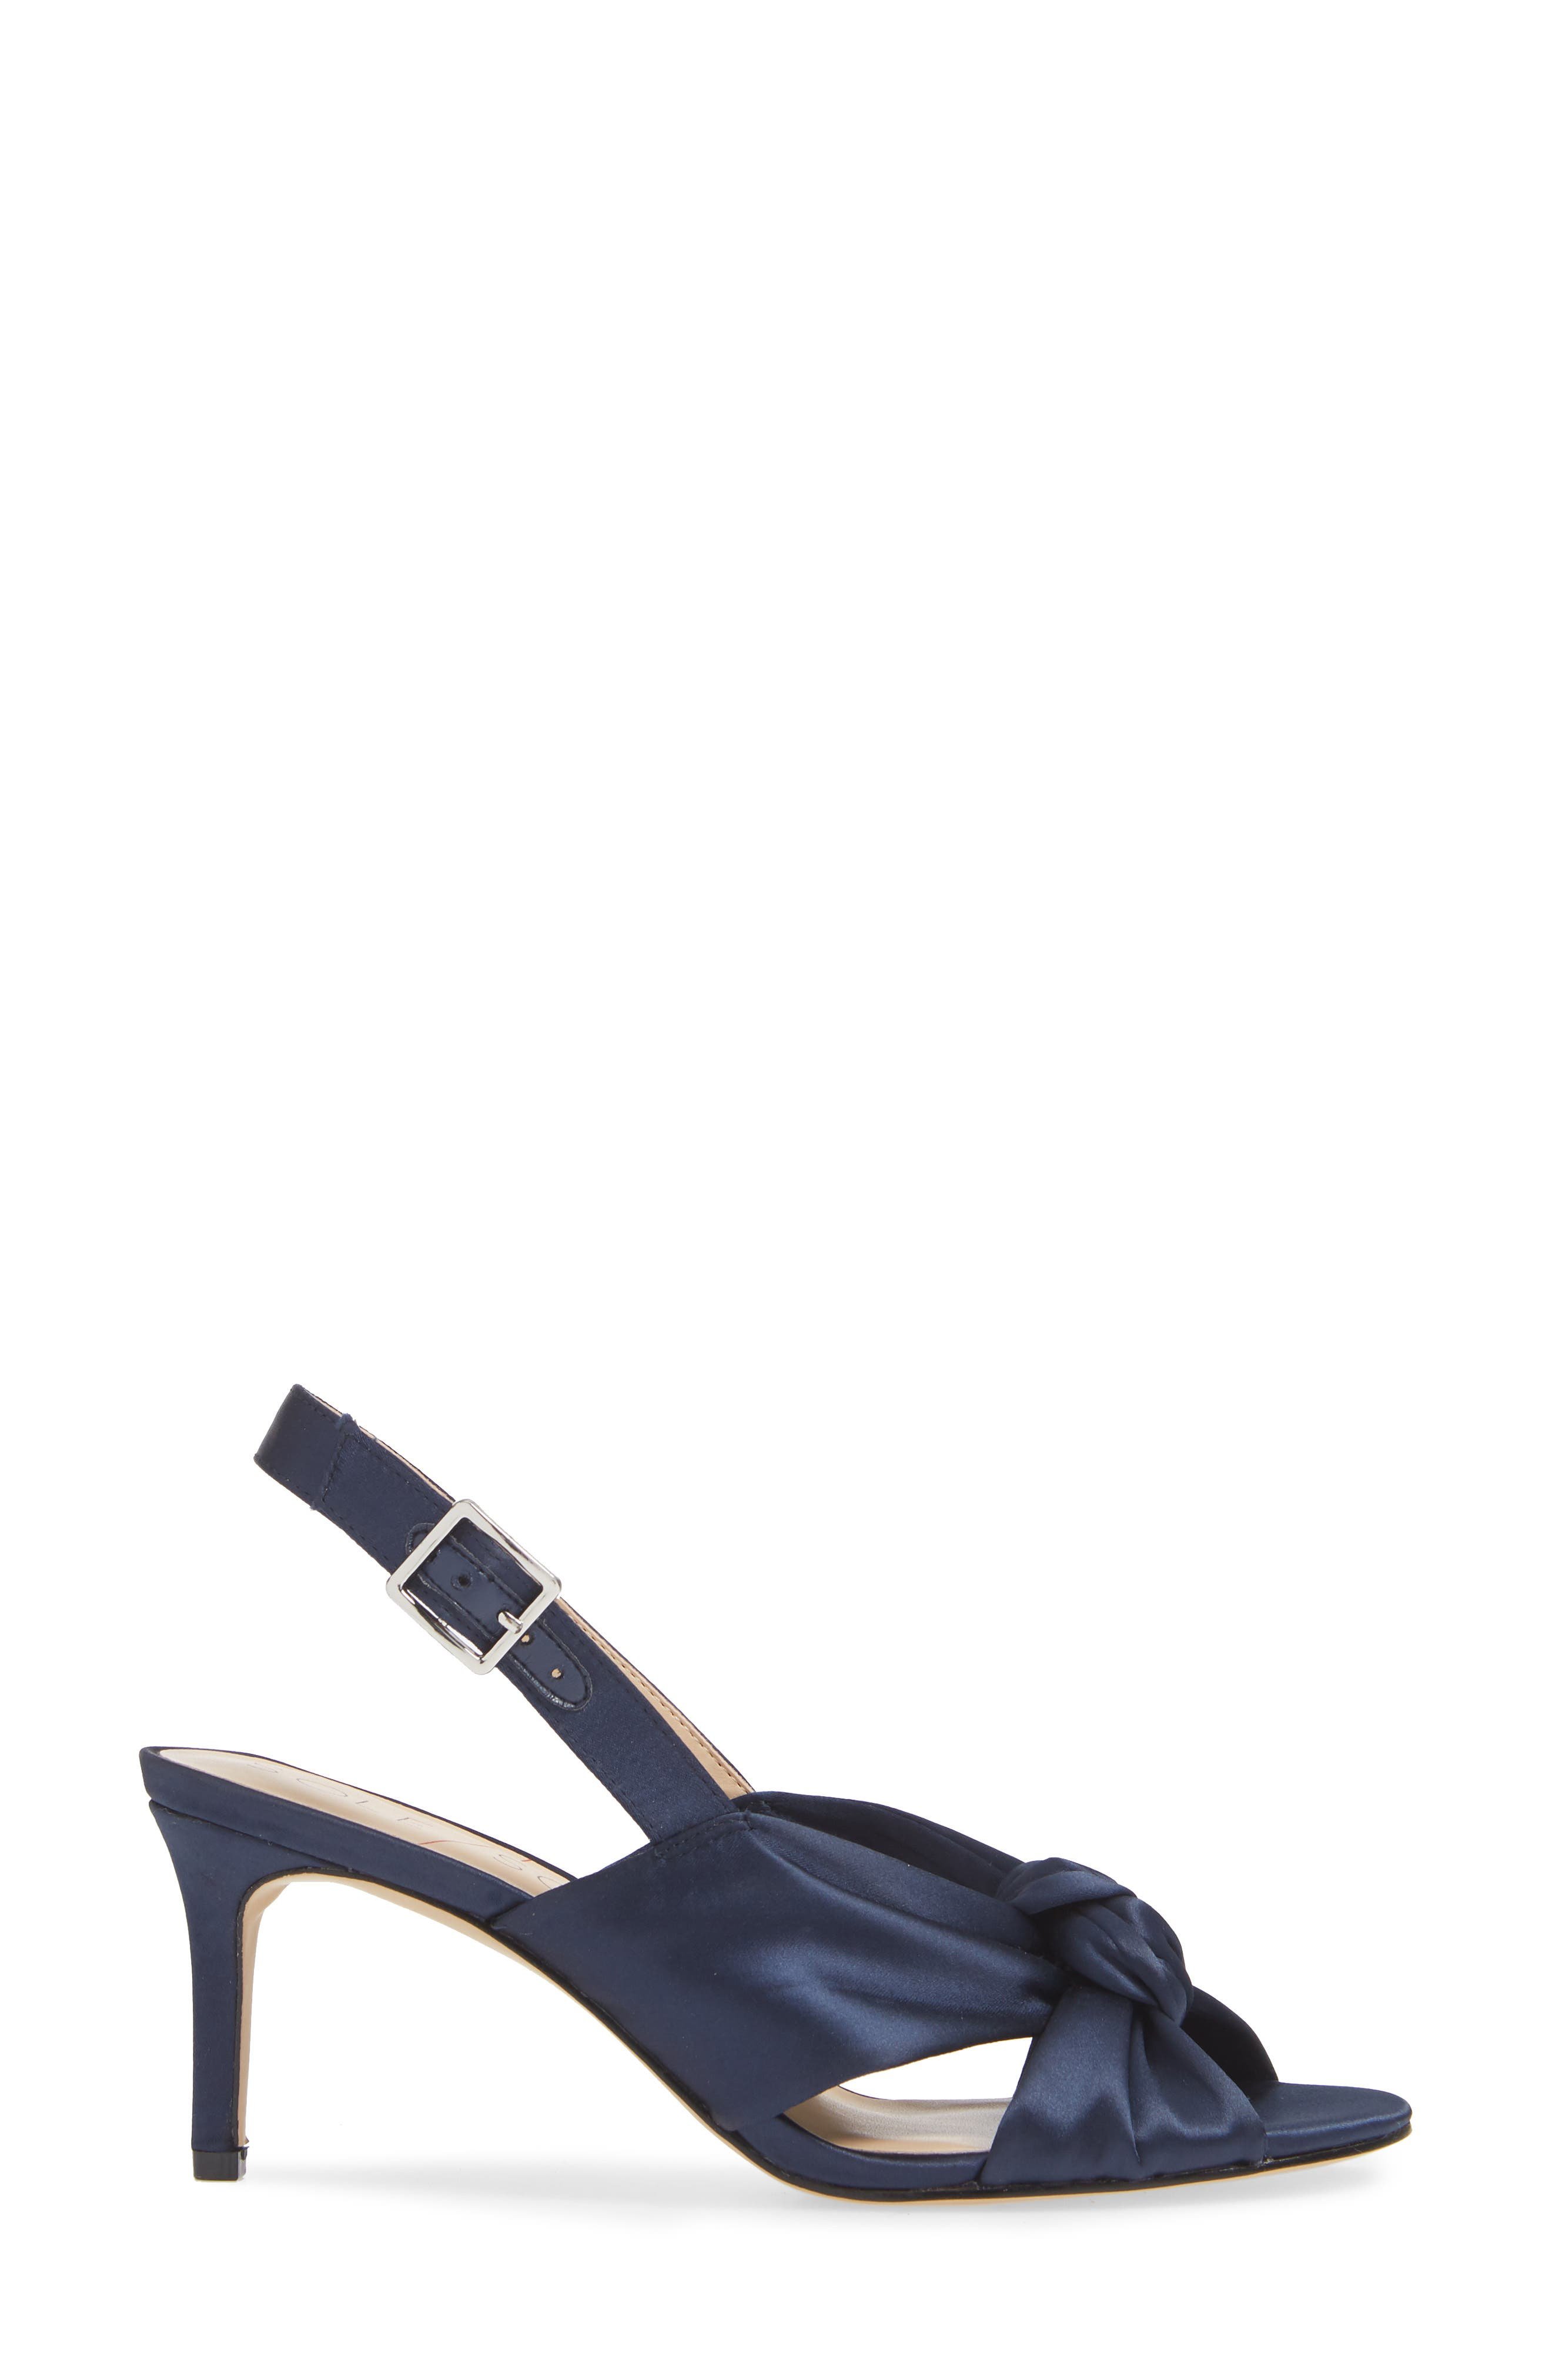 Genneene Knotted Slingback Sandal,                             Alternate thumbnail 3, color,                             MIDNIGHT SATIN